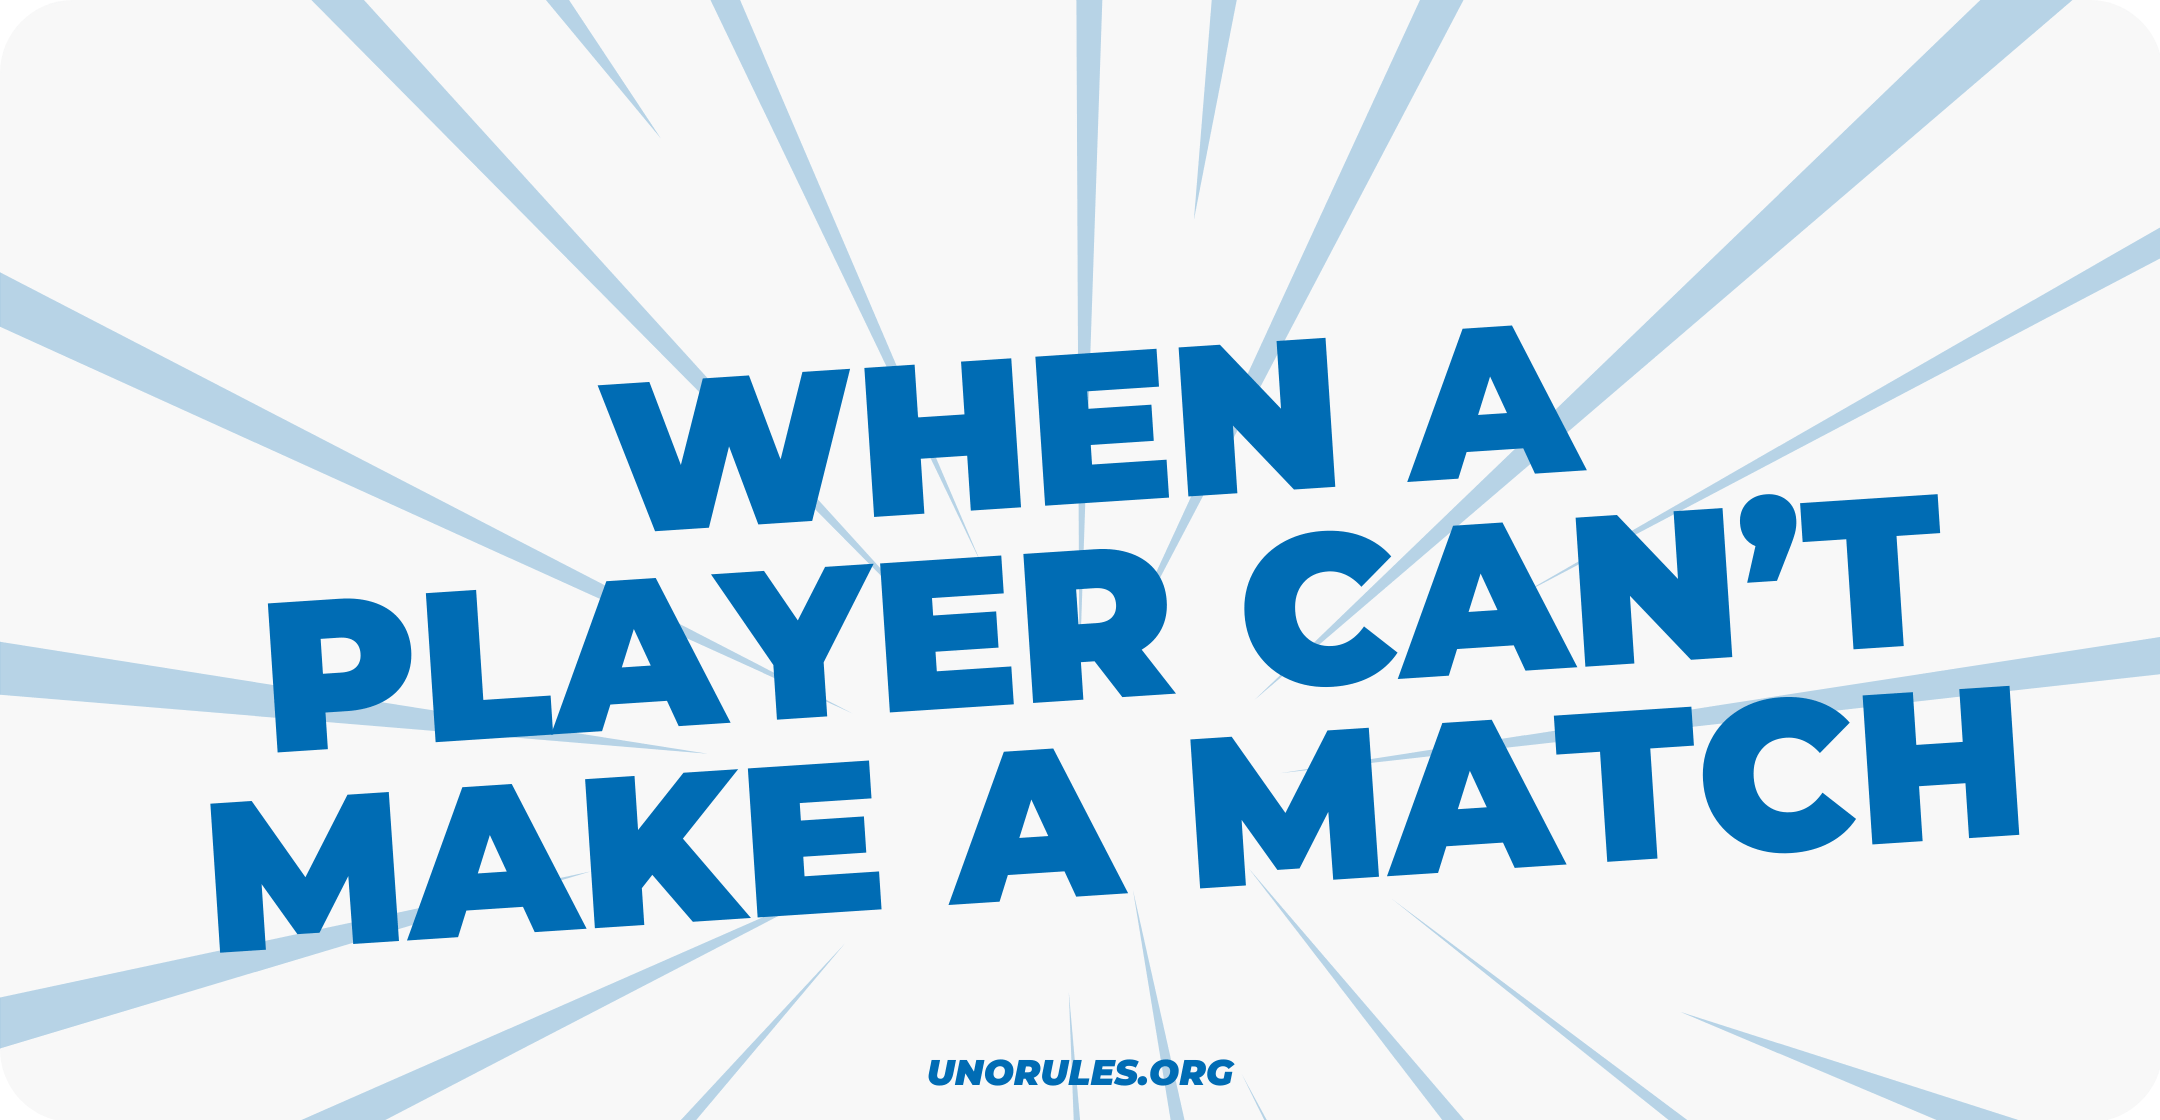 When a player can't make a match